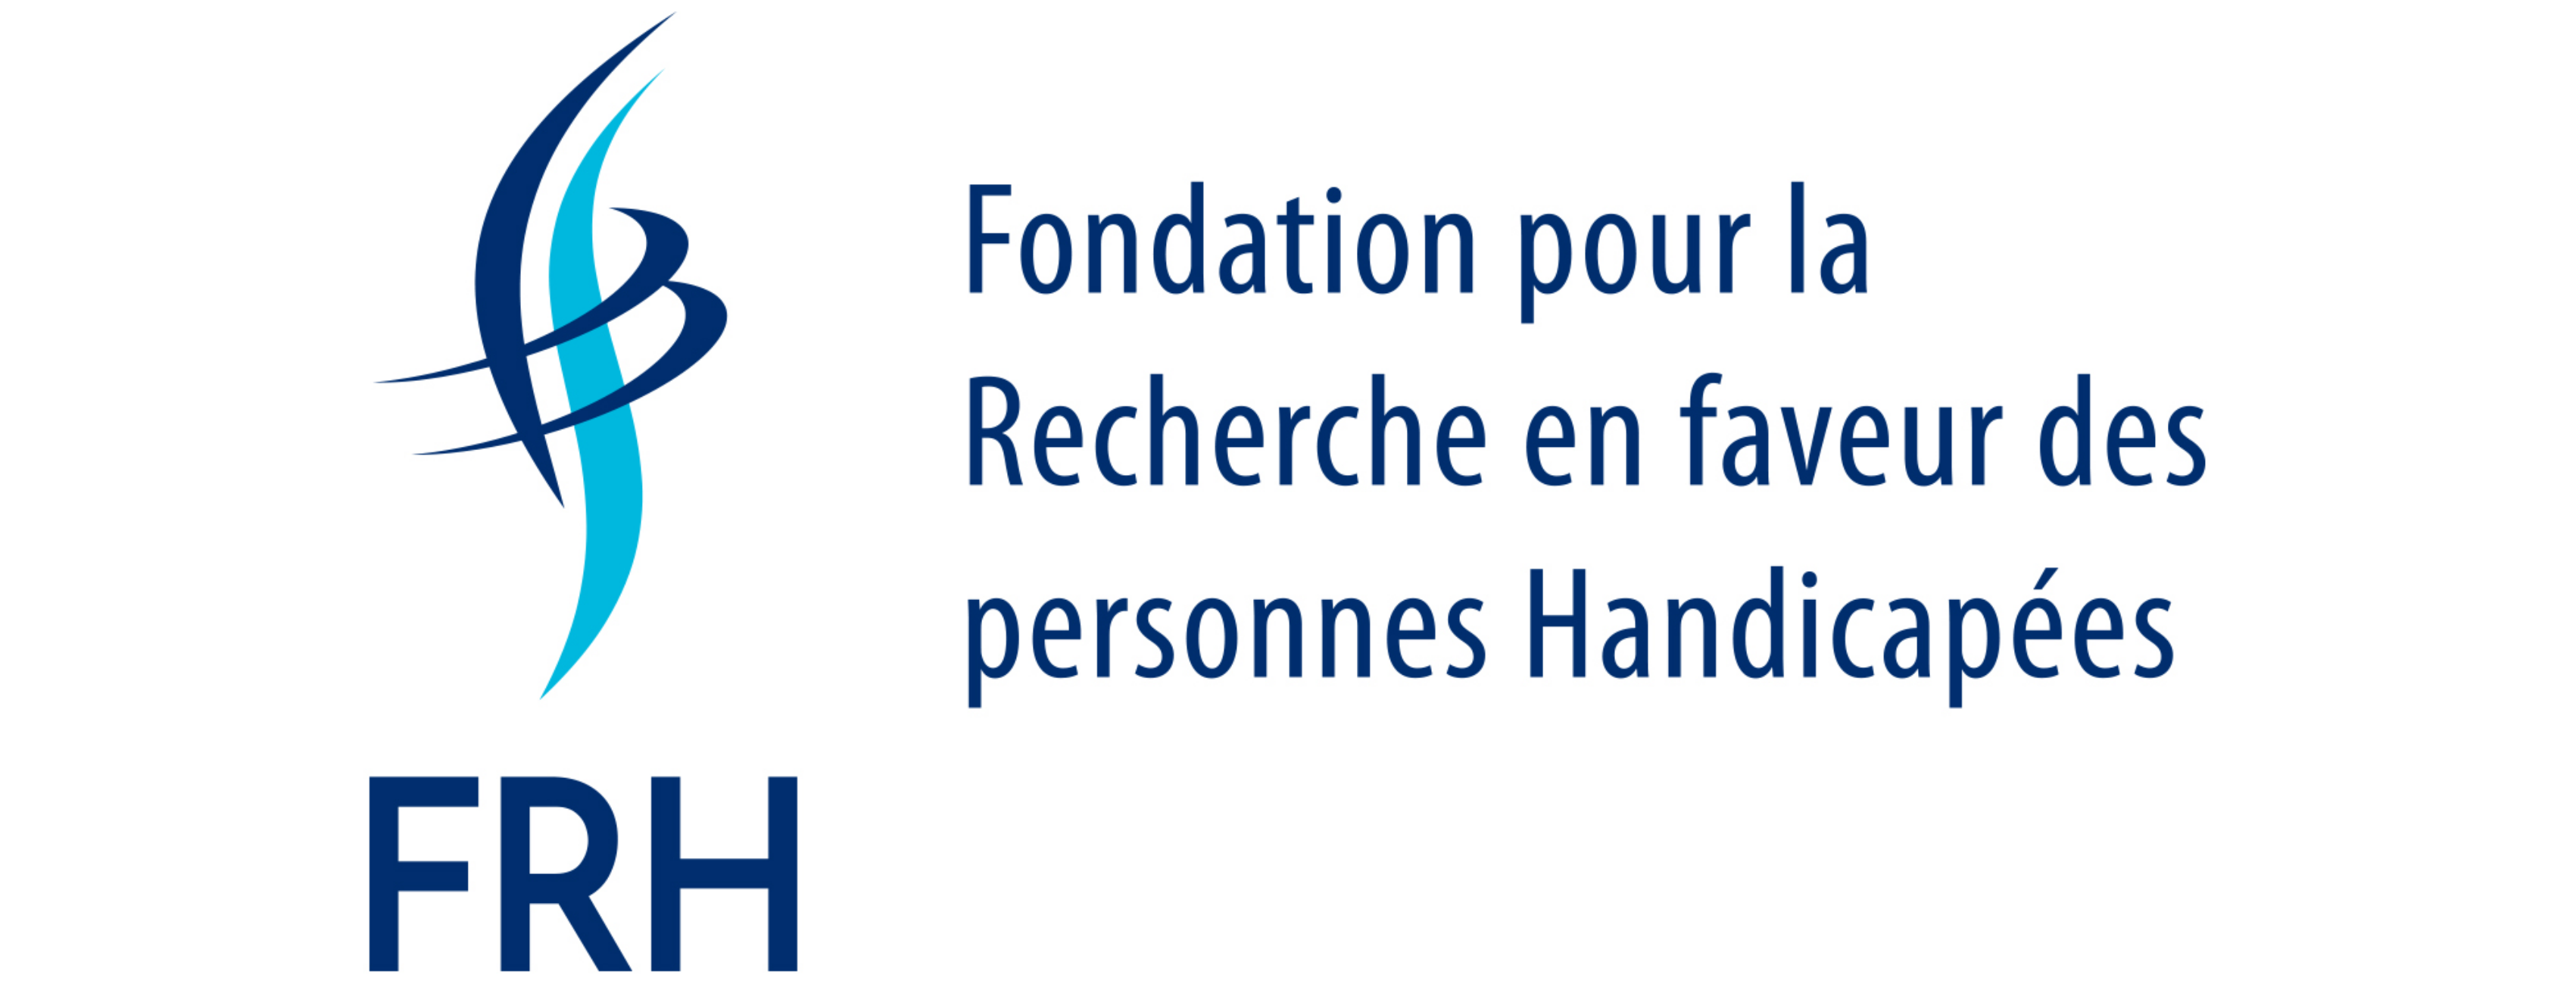 FRH Fondation